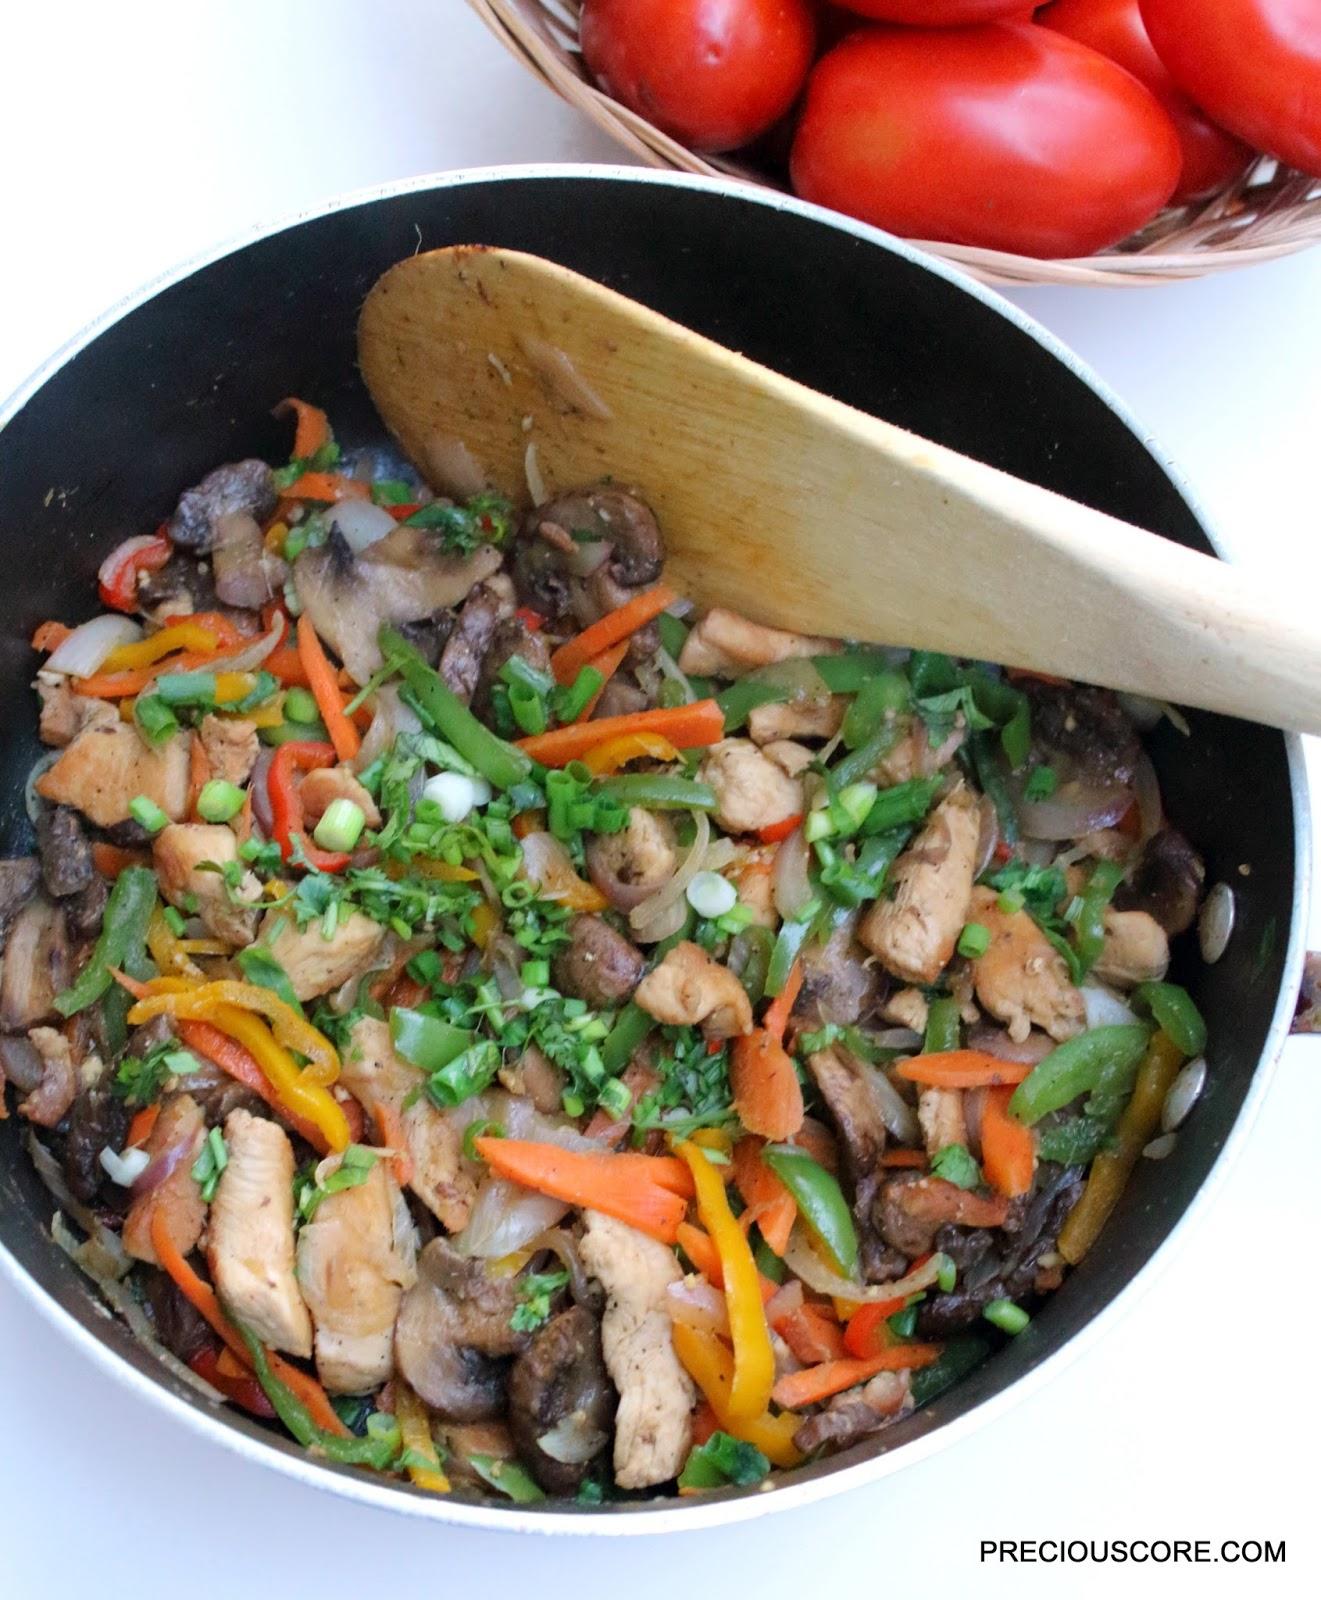 Chicken and Mushroom Stir Fry